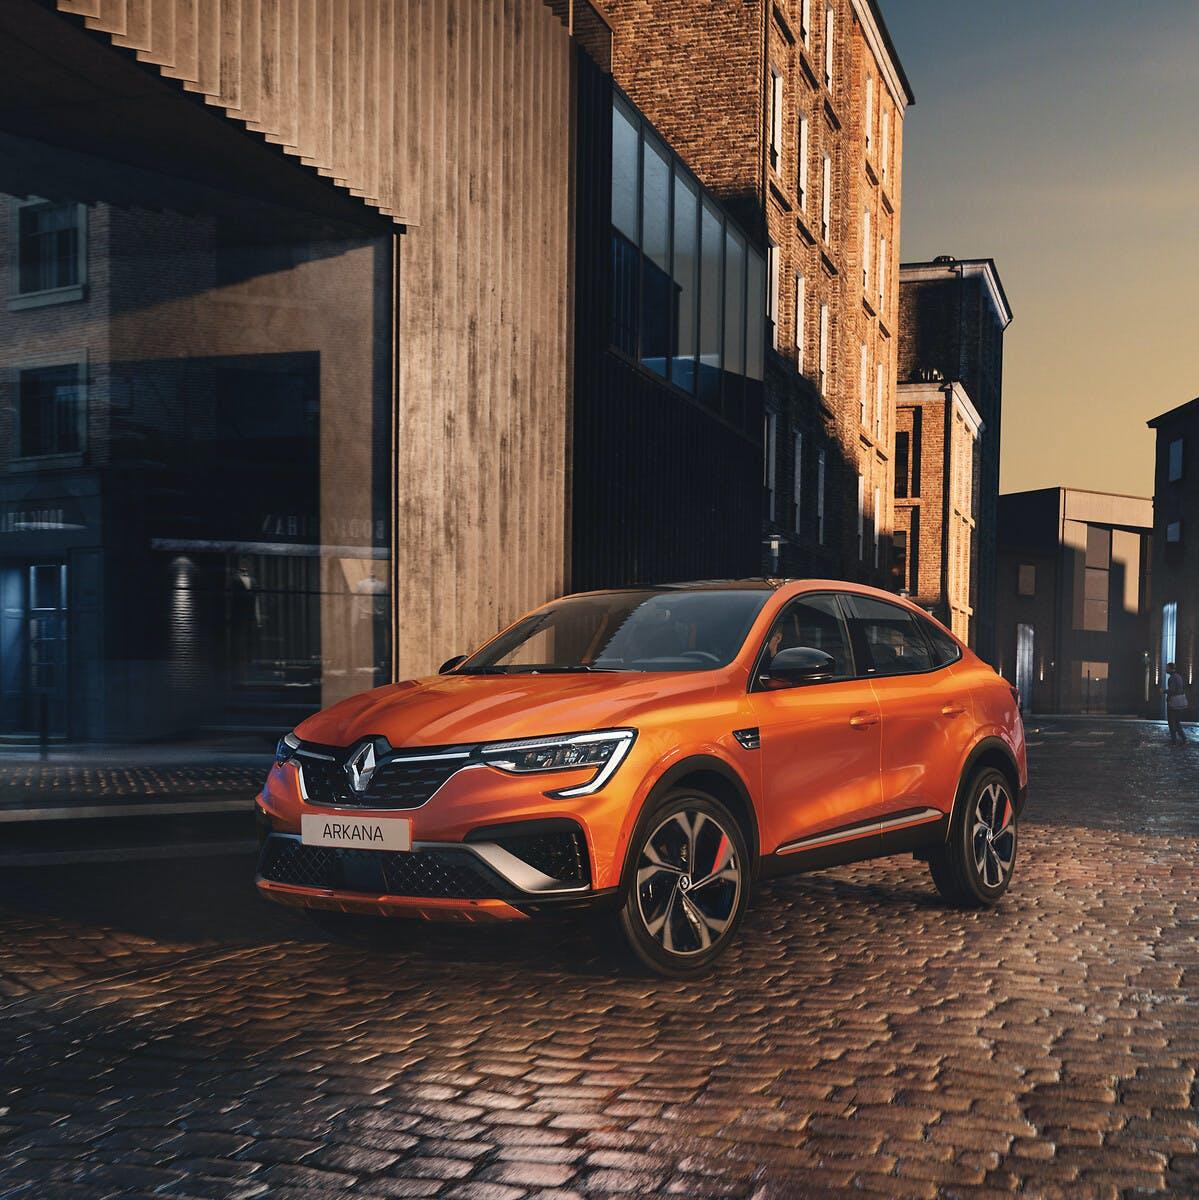 Nuova Renault Arkana arancione tre quarti anteriore